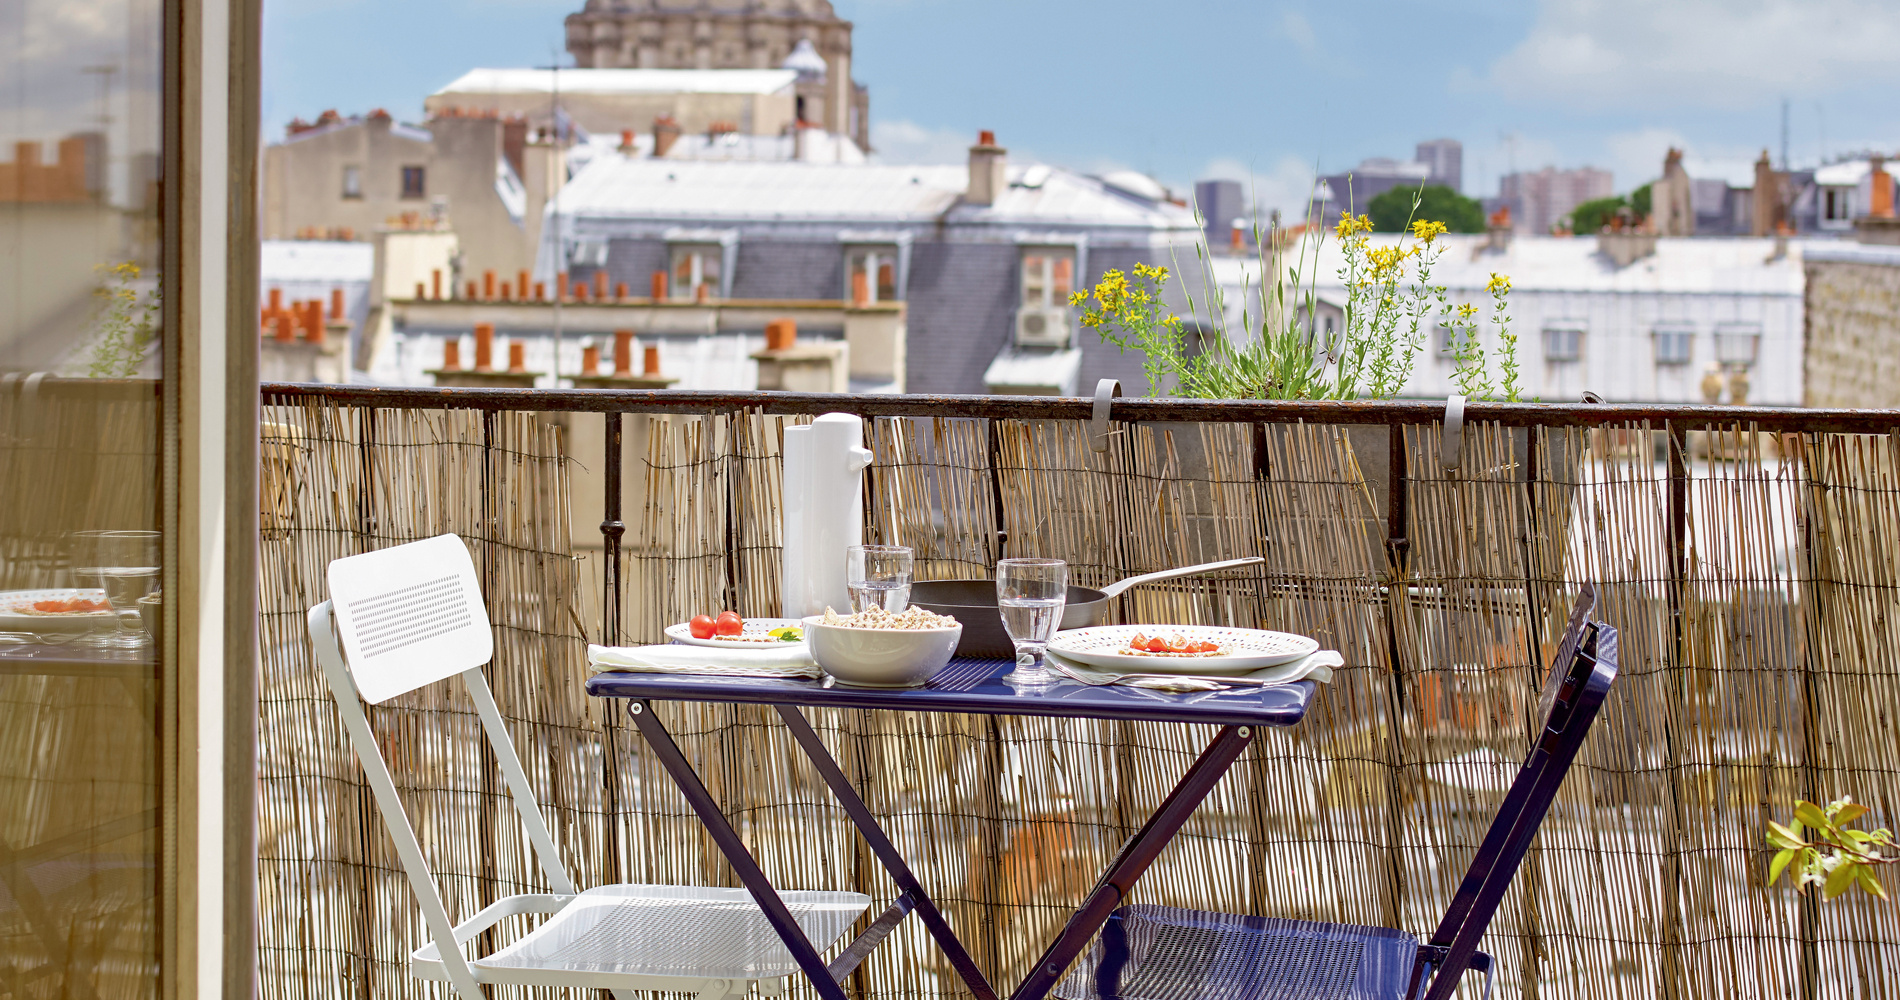 Table Pour Balcon Étroit sept astuces pour aménager un petit balcon - madame figaro